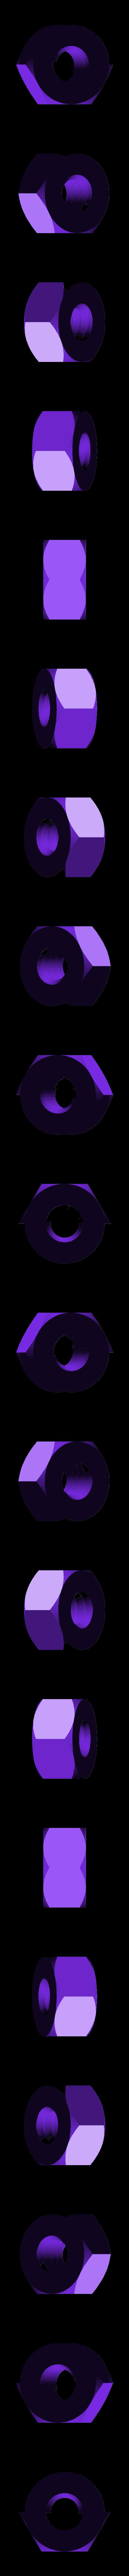 nut.stl Download free STL file Archimedes Screw Bonanza • 3D printer design, Urulysman